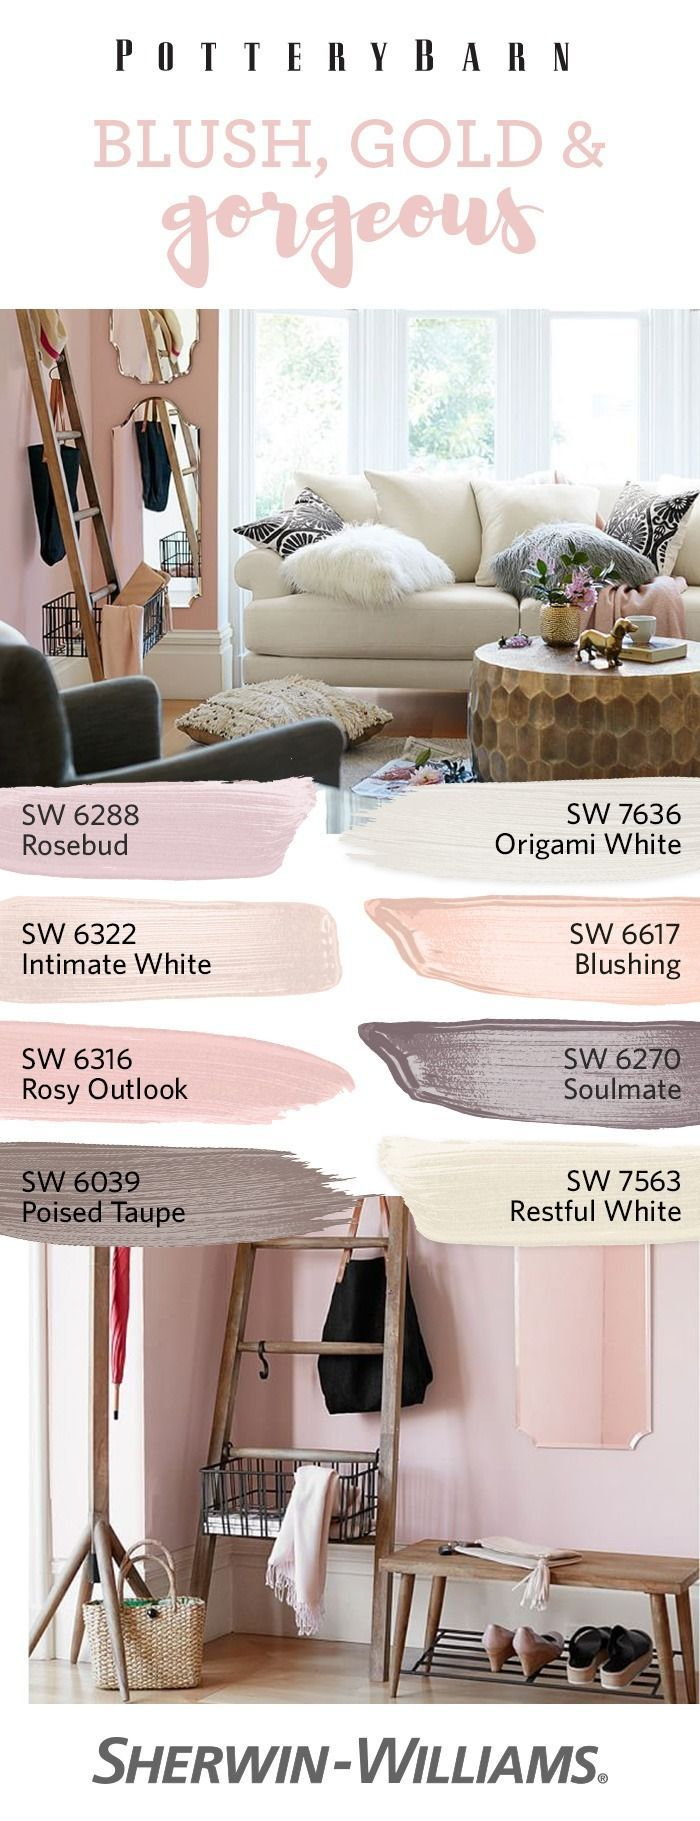 New Home Decor | New Furniture | New Home Accessories